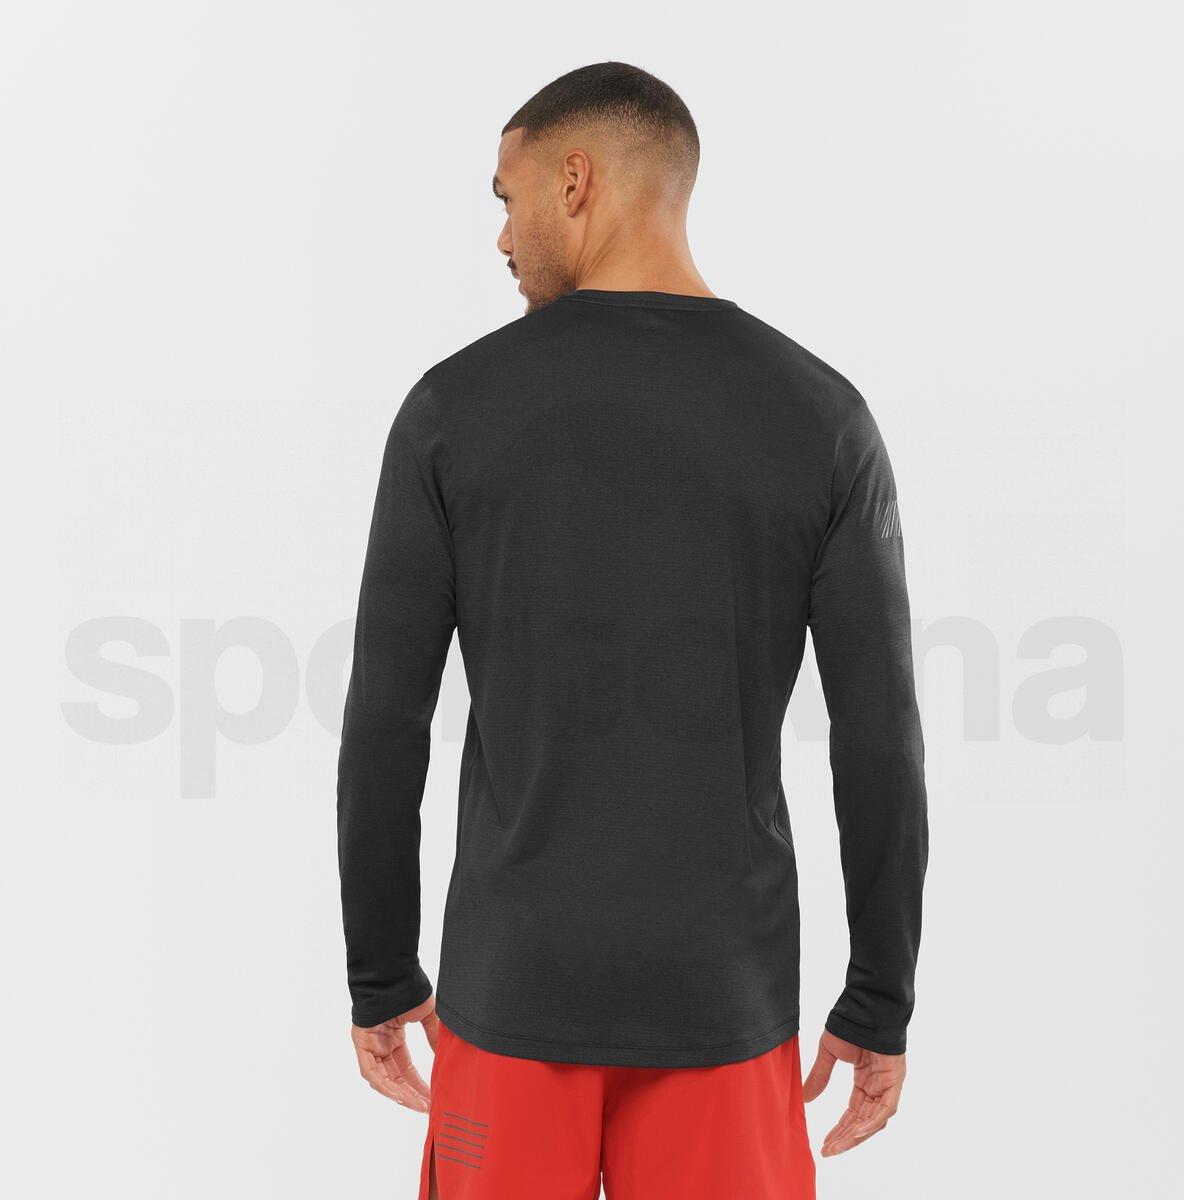 Tričko Salomon AGILE LS TEE M - černá